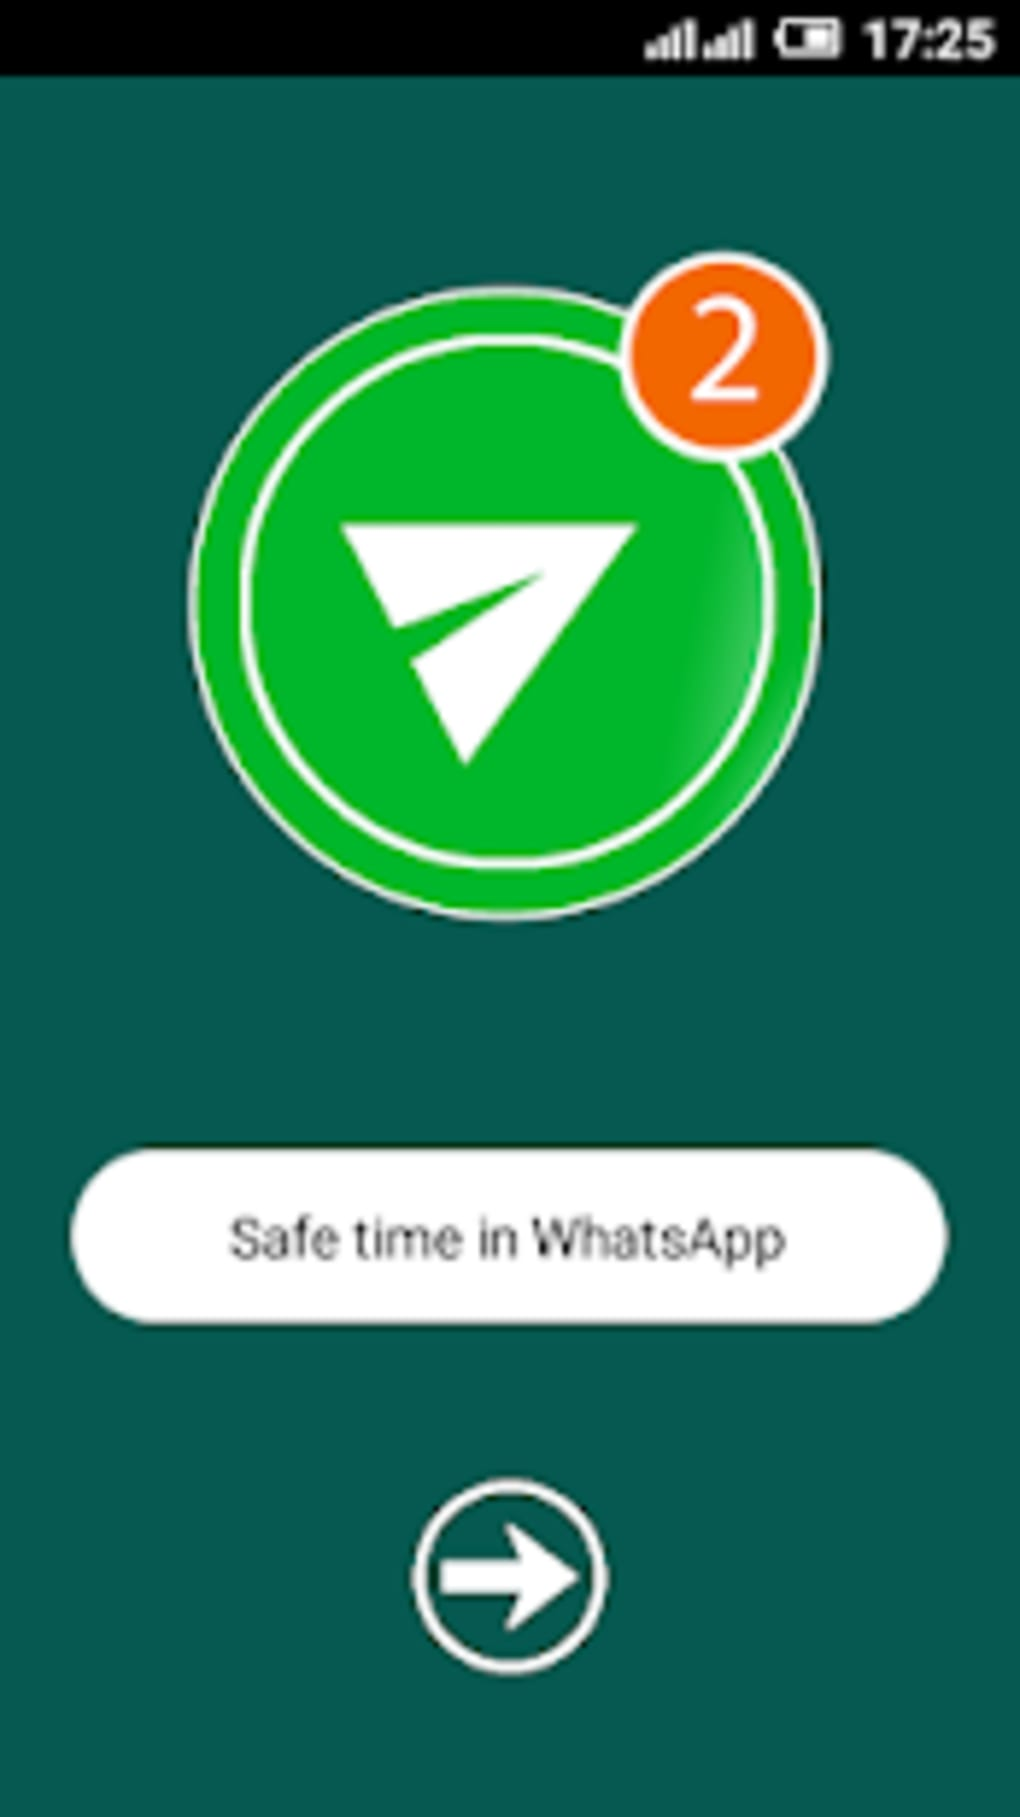 Www whatsapp com/android deutsch  WhatsApp Messenger 2 19